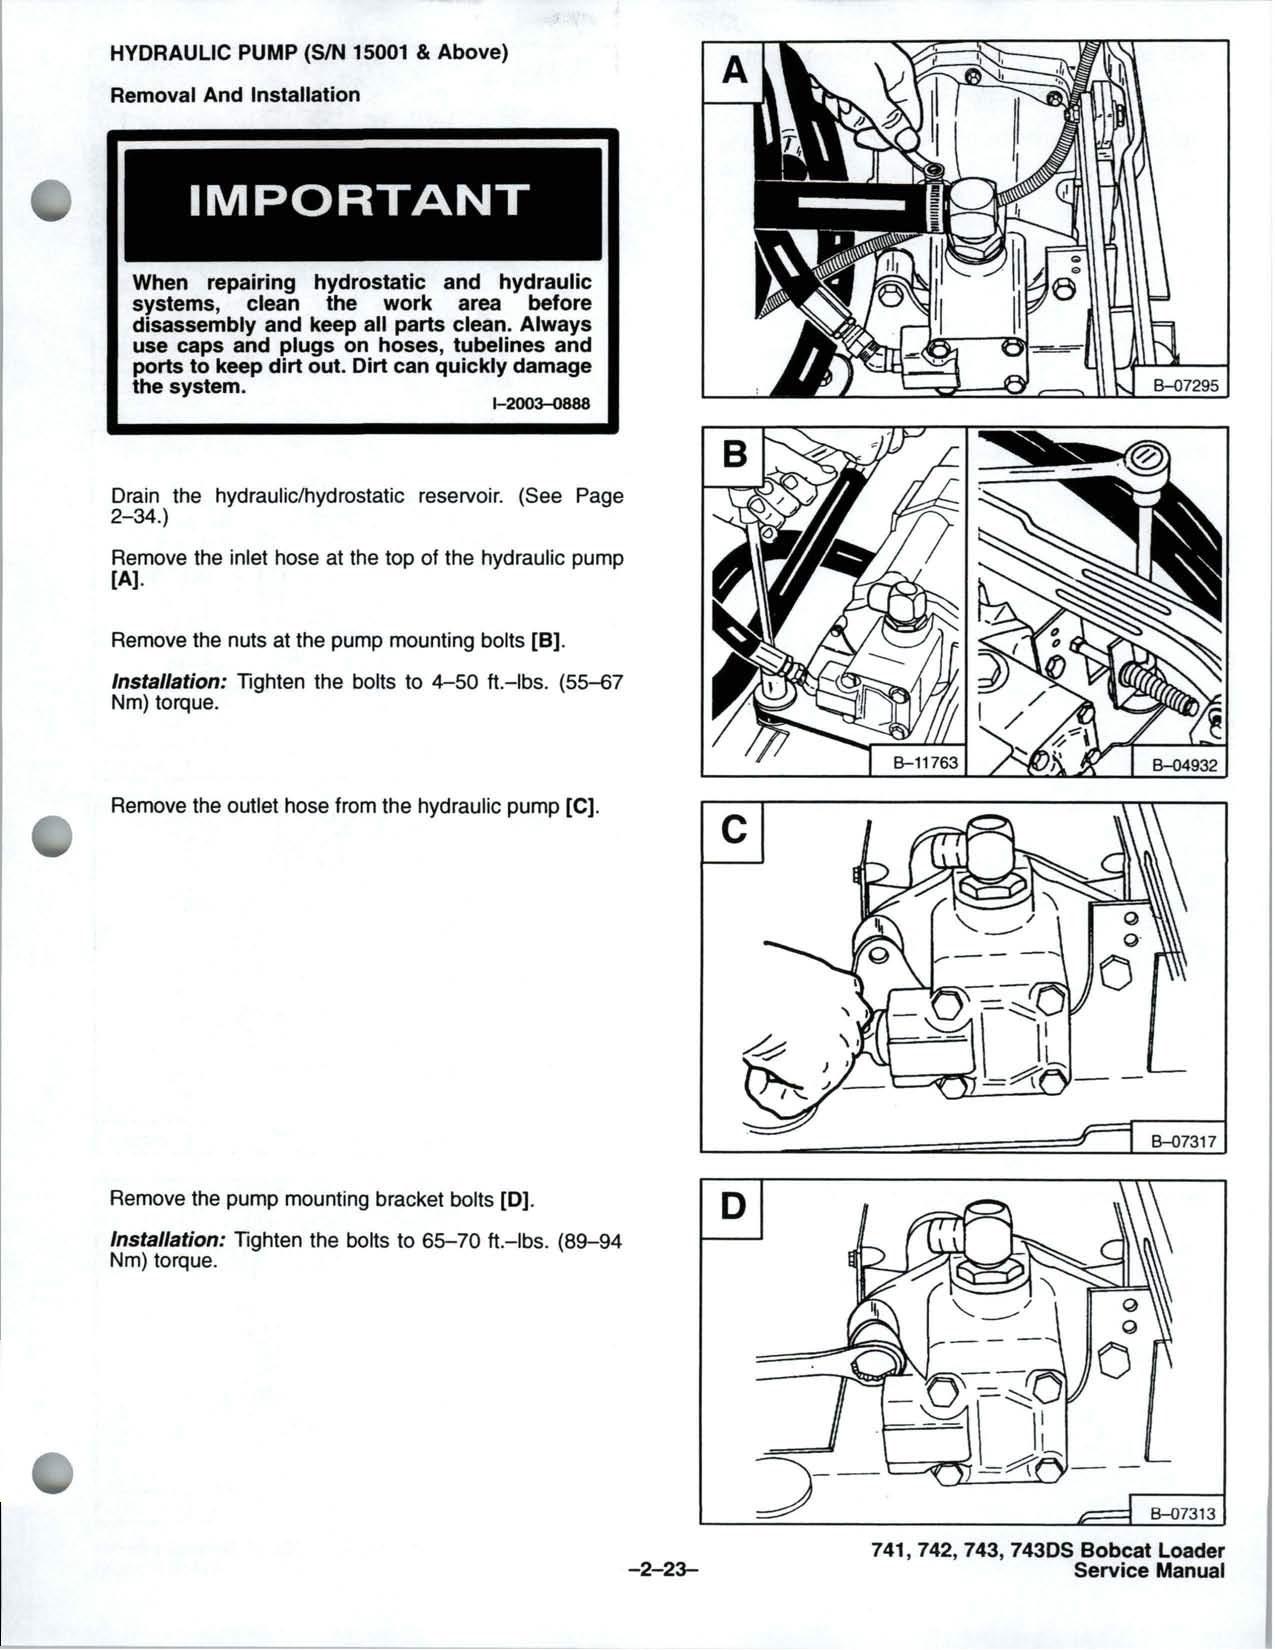 Bobcat 743 service manual free